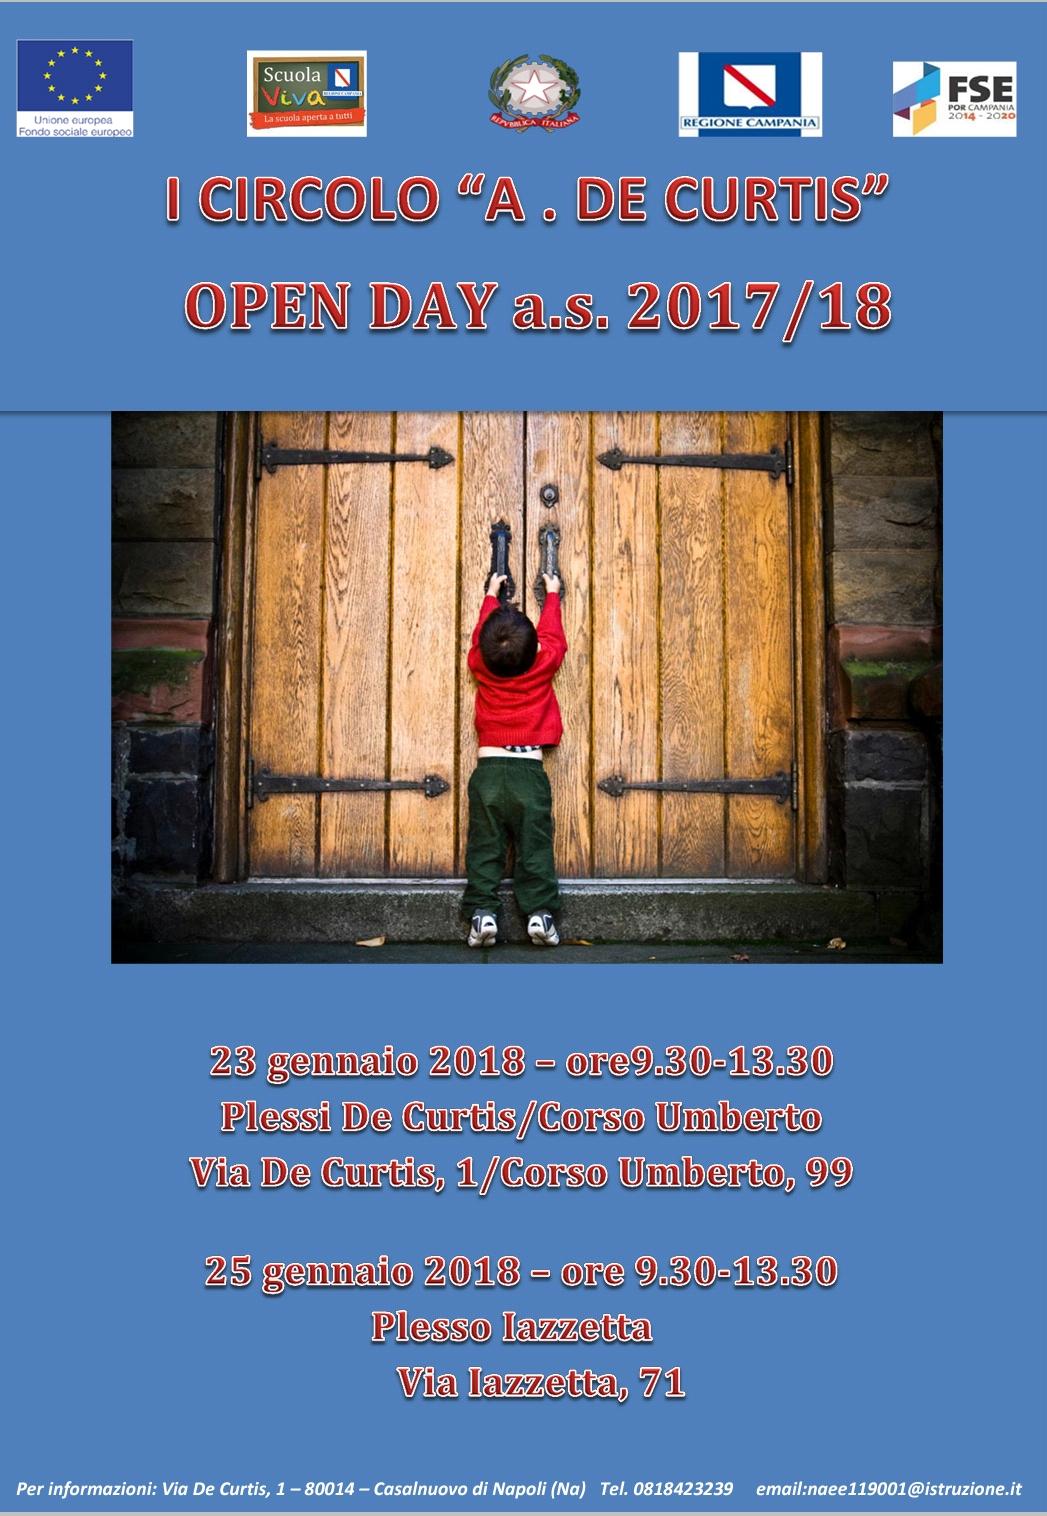 OPEN DAY 23 E 25